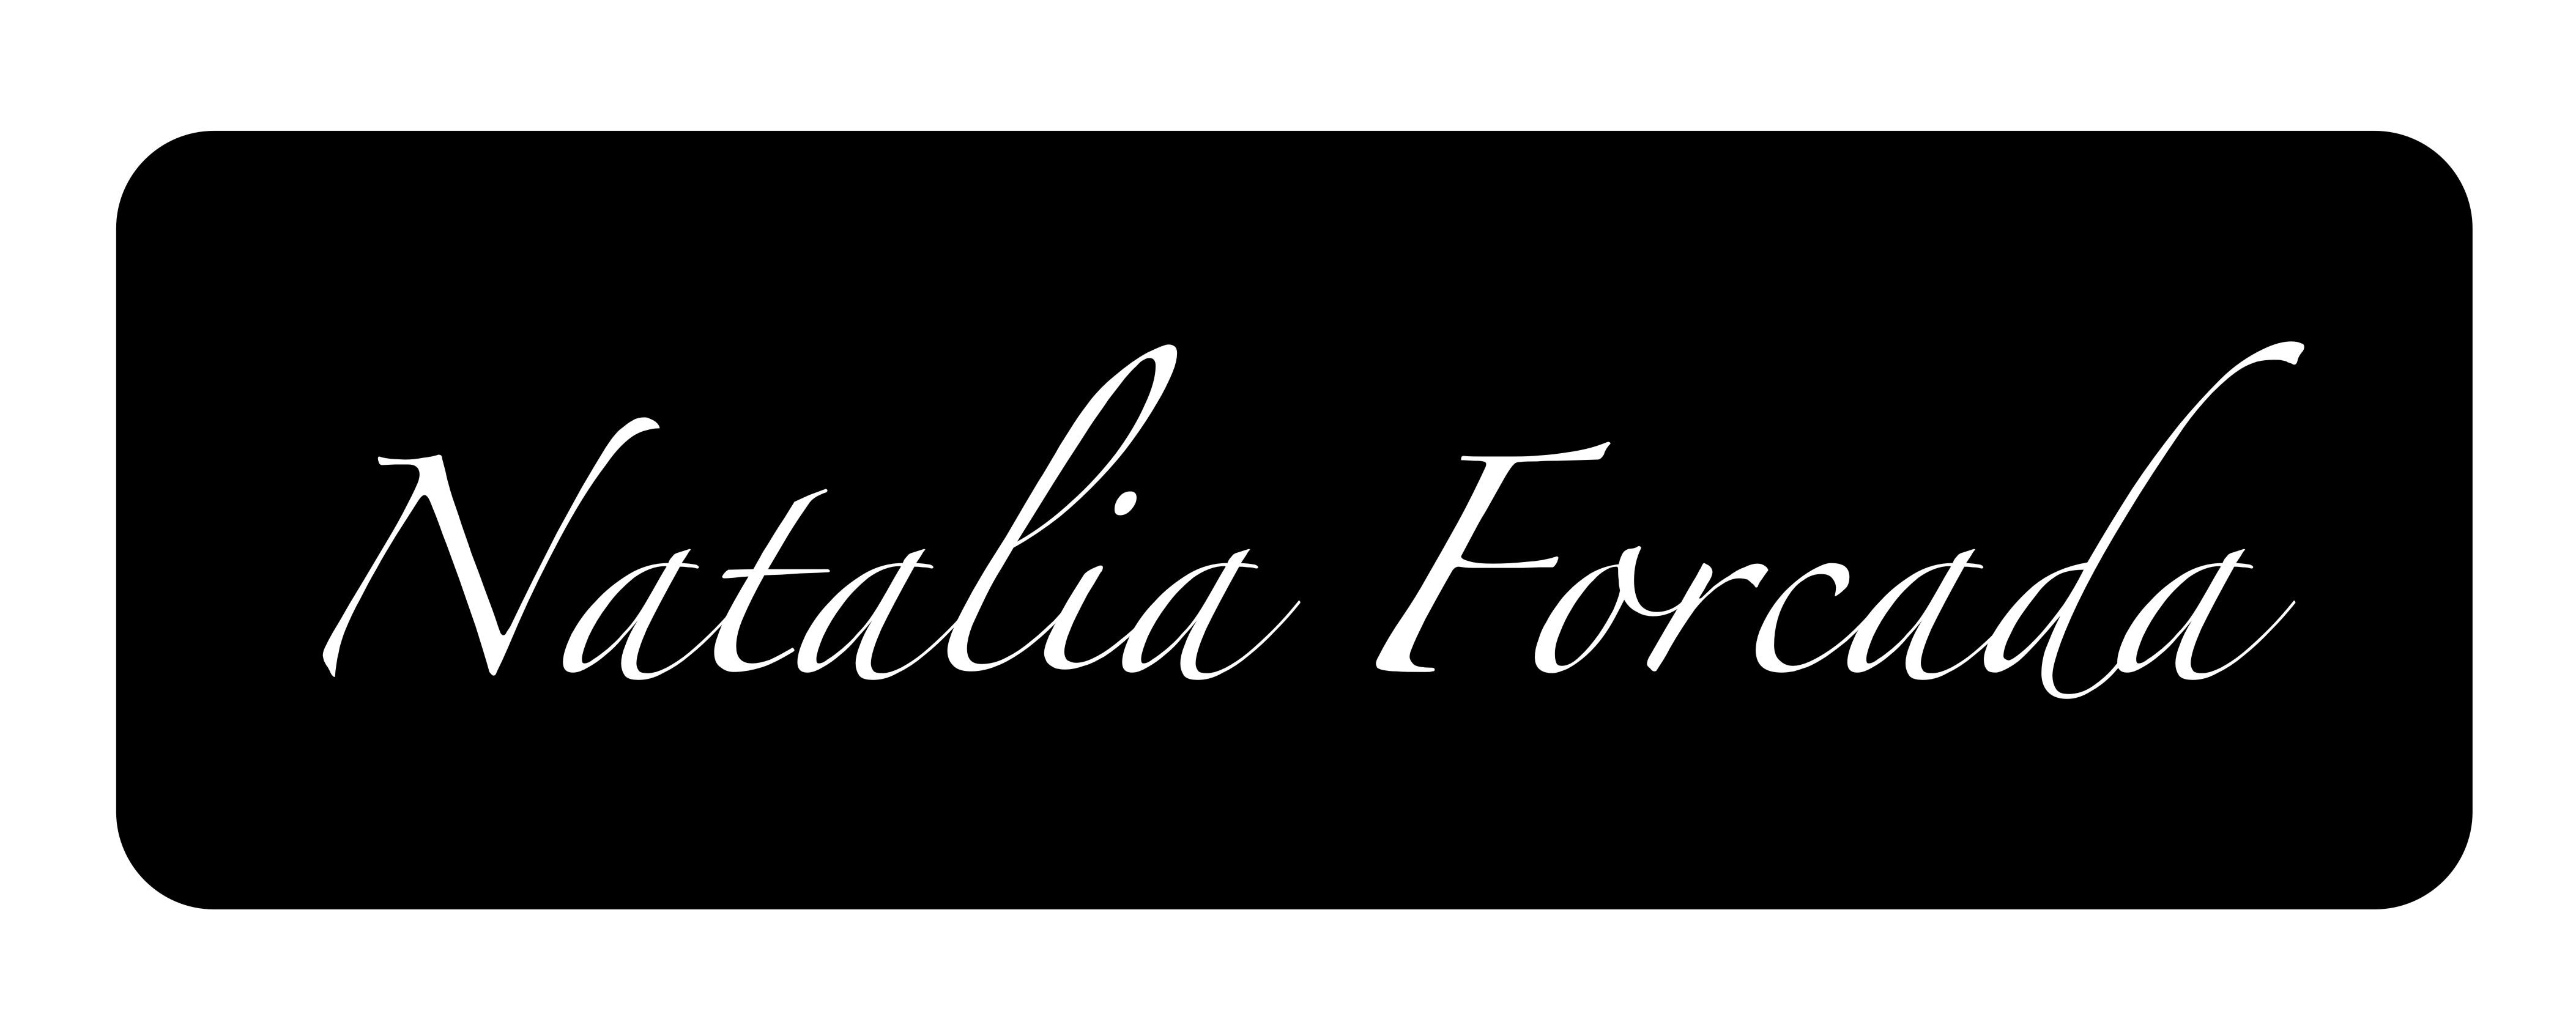 Natalia Forcada Signature